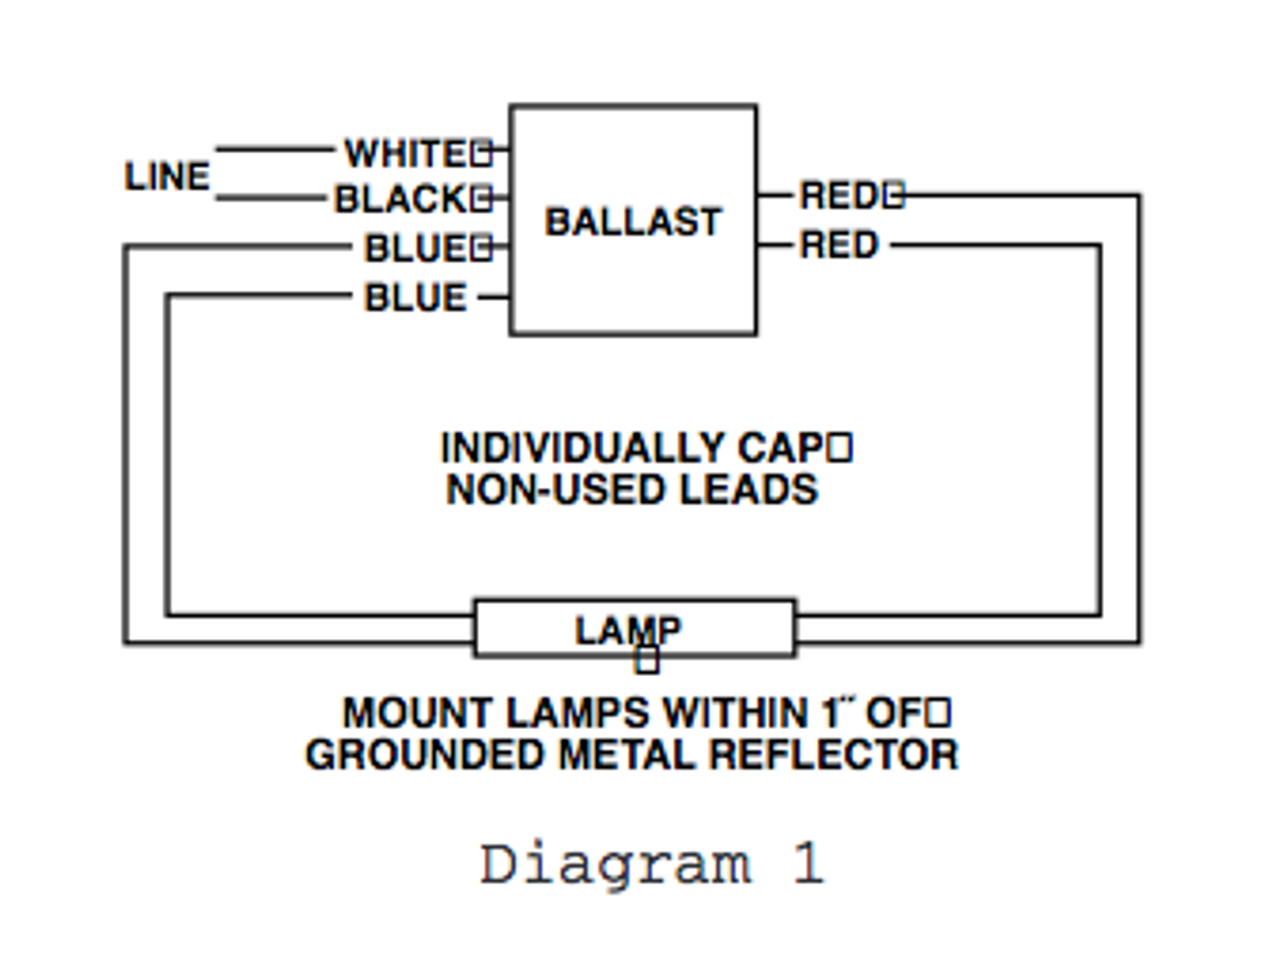 Universal 256-448-800 T12HO Magnetic Sign Ballast fluorescent ballast wiring diagram BallastShop.com